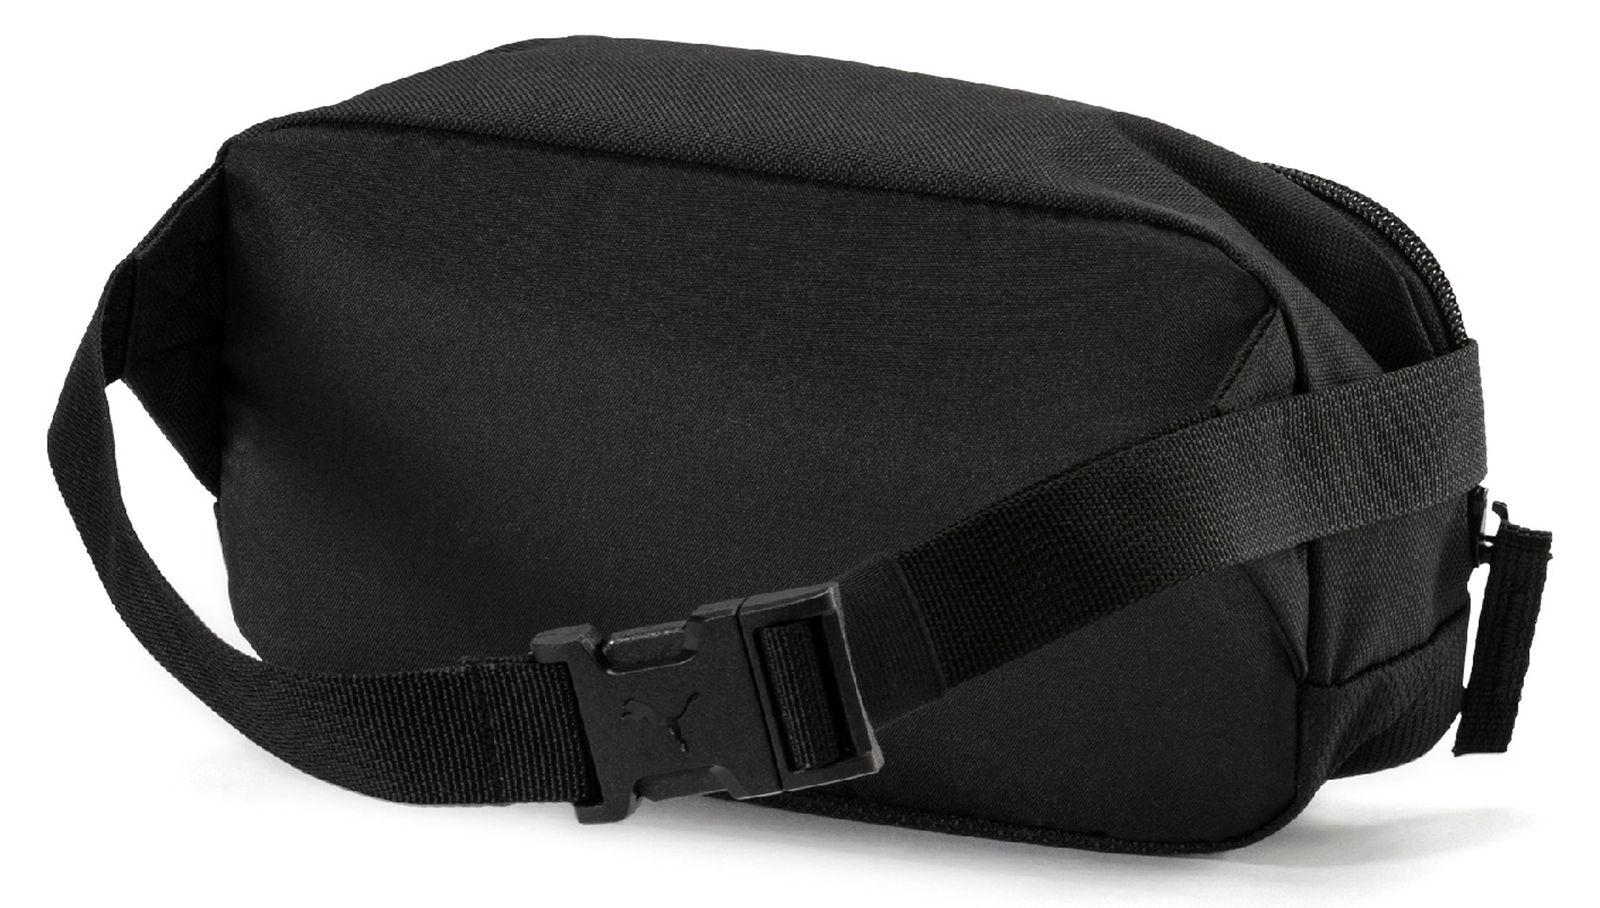 chaussures de sport 37f96 68d37 PUMA S Waist Bag Puma Black